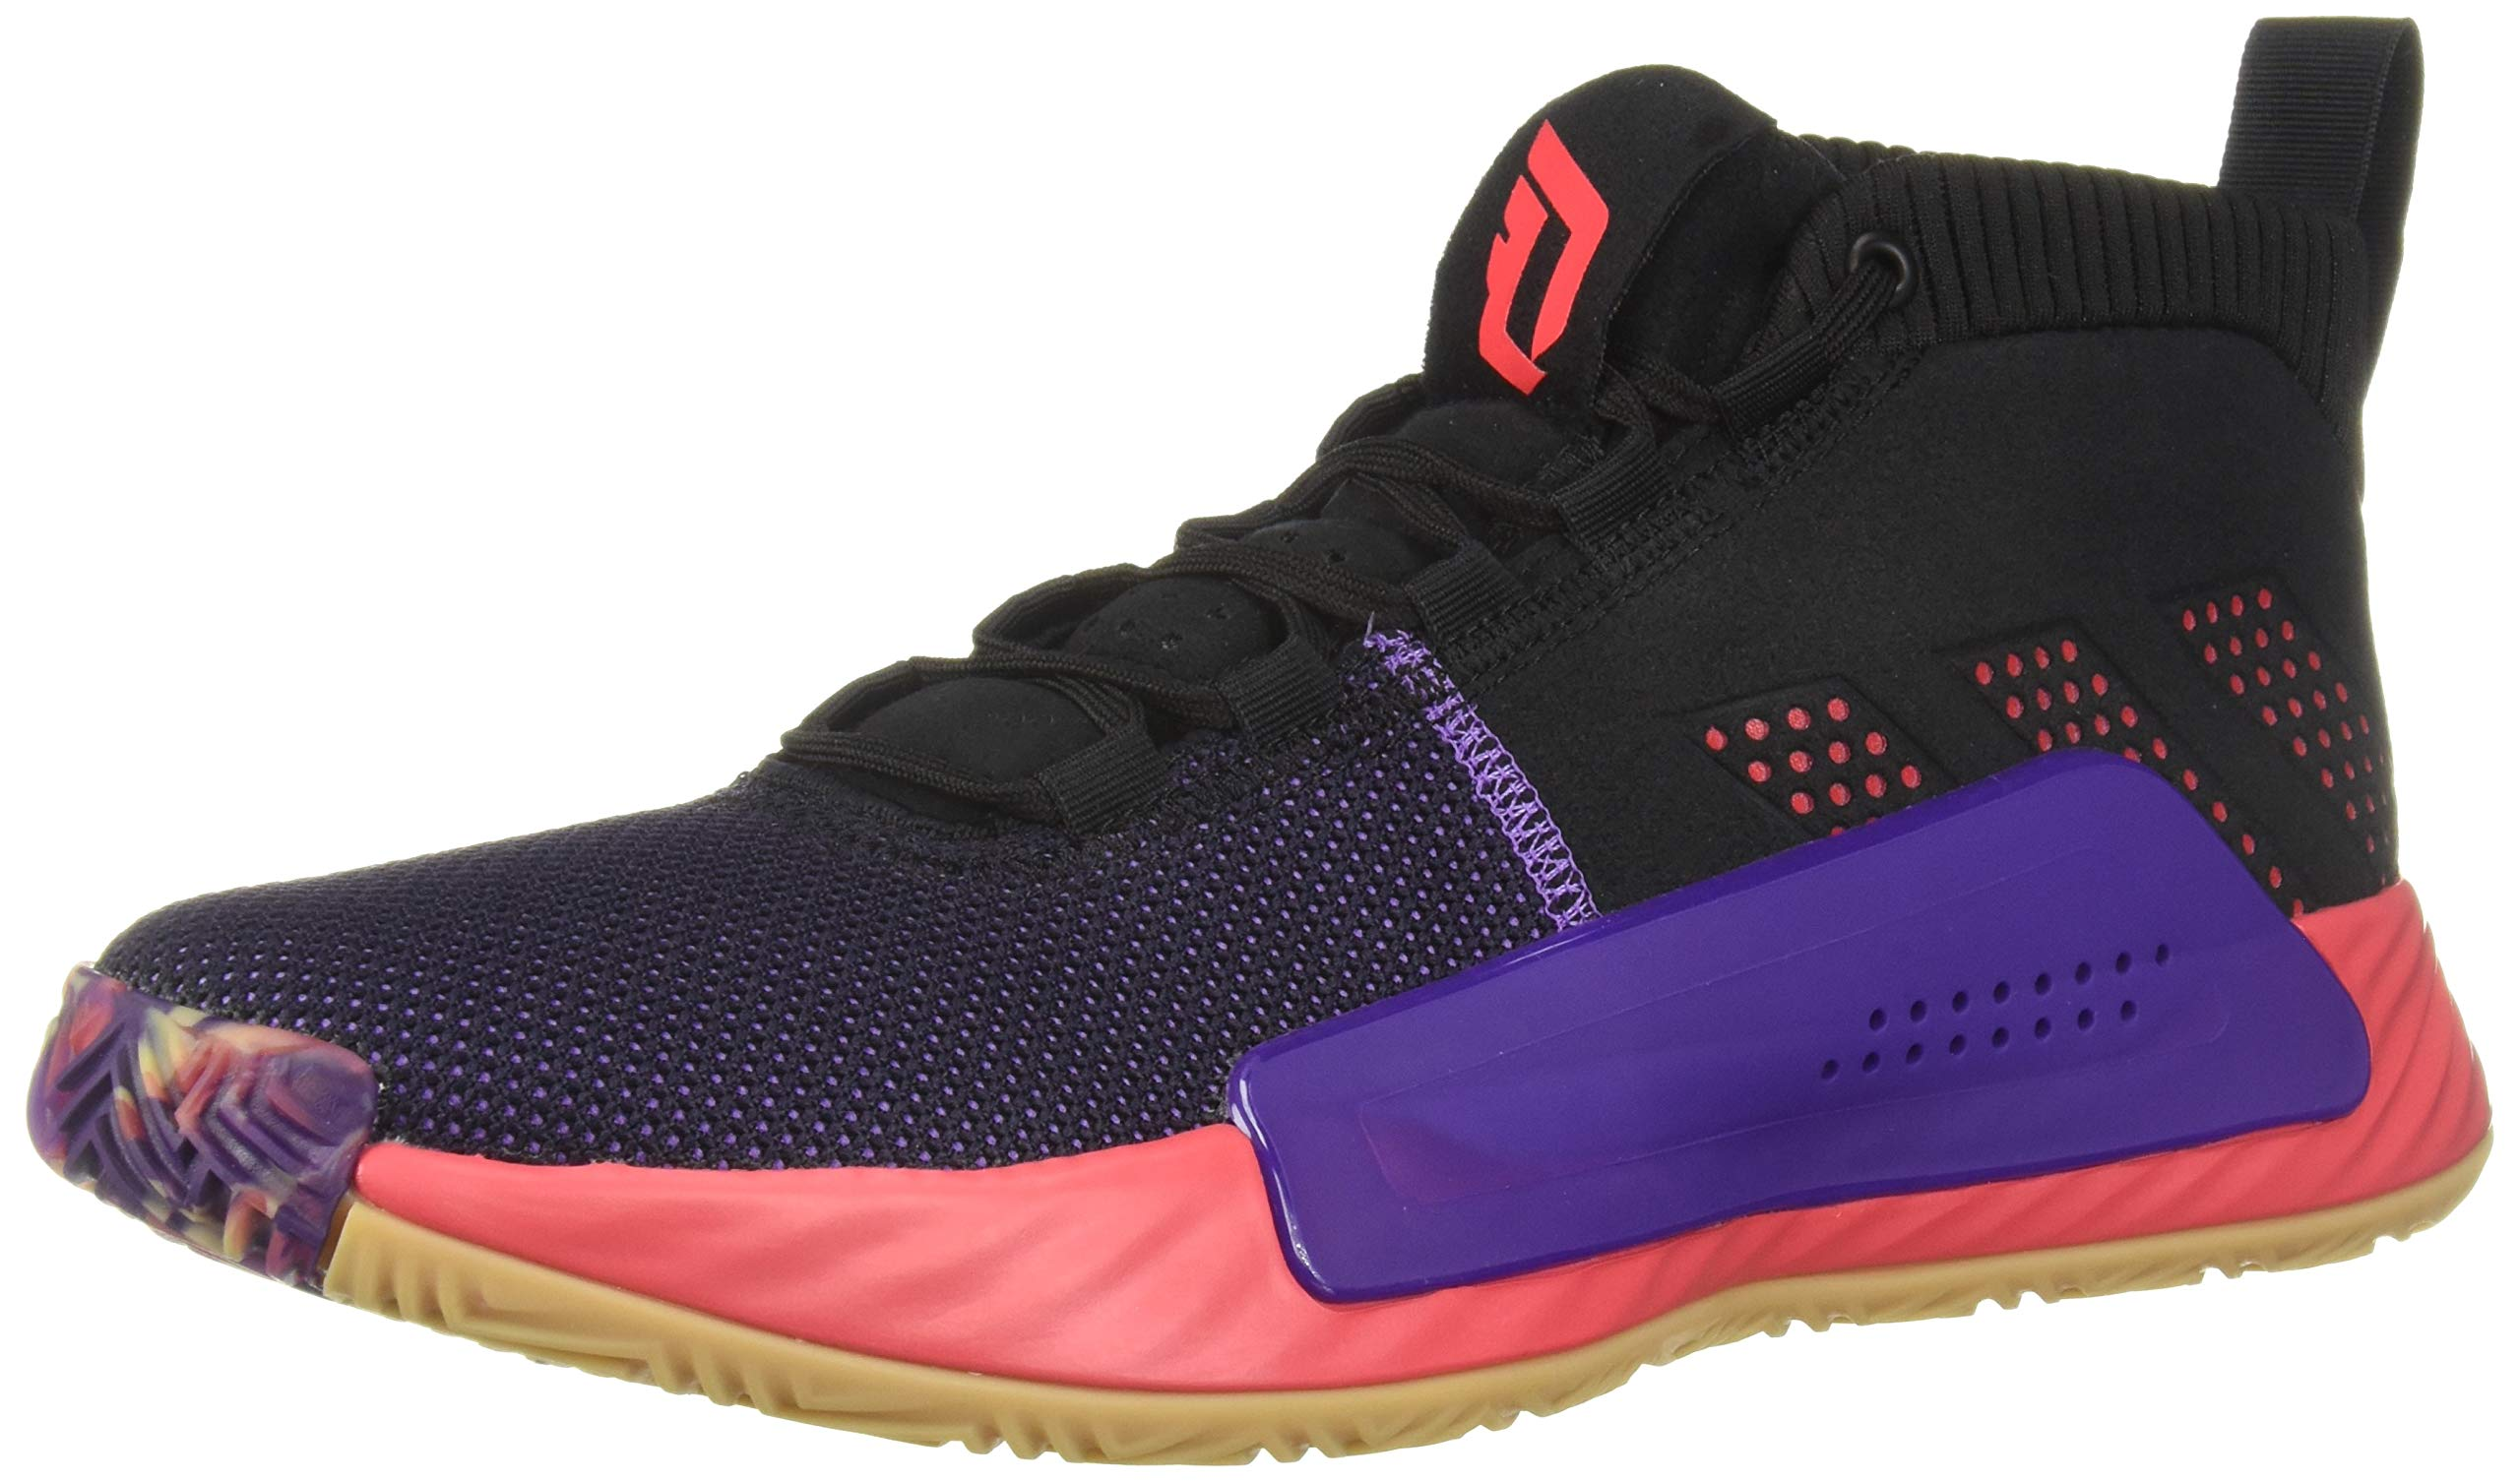 adidas Men's Dame 5, Black/Shock red/Active Purple, 6.5 M US